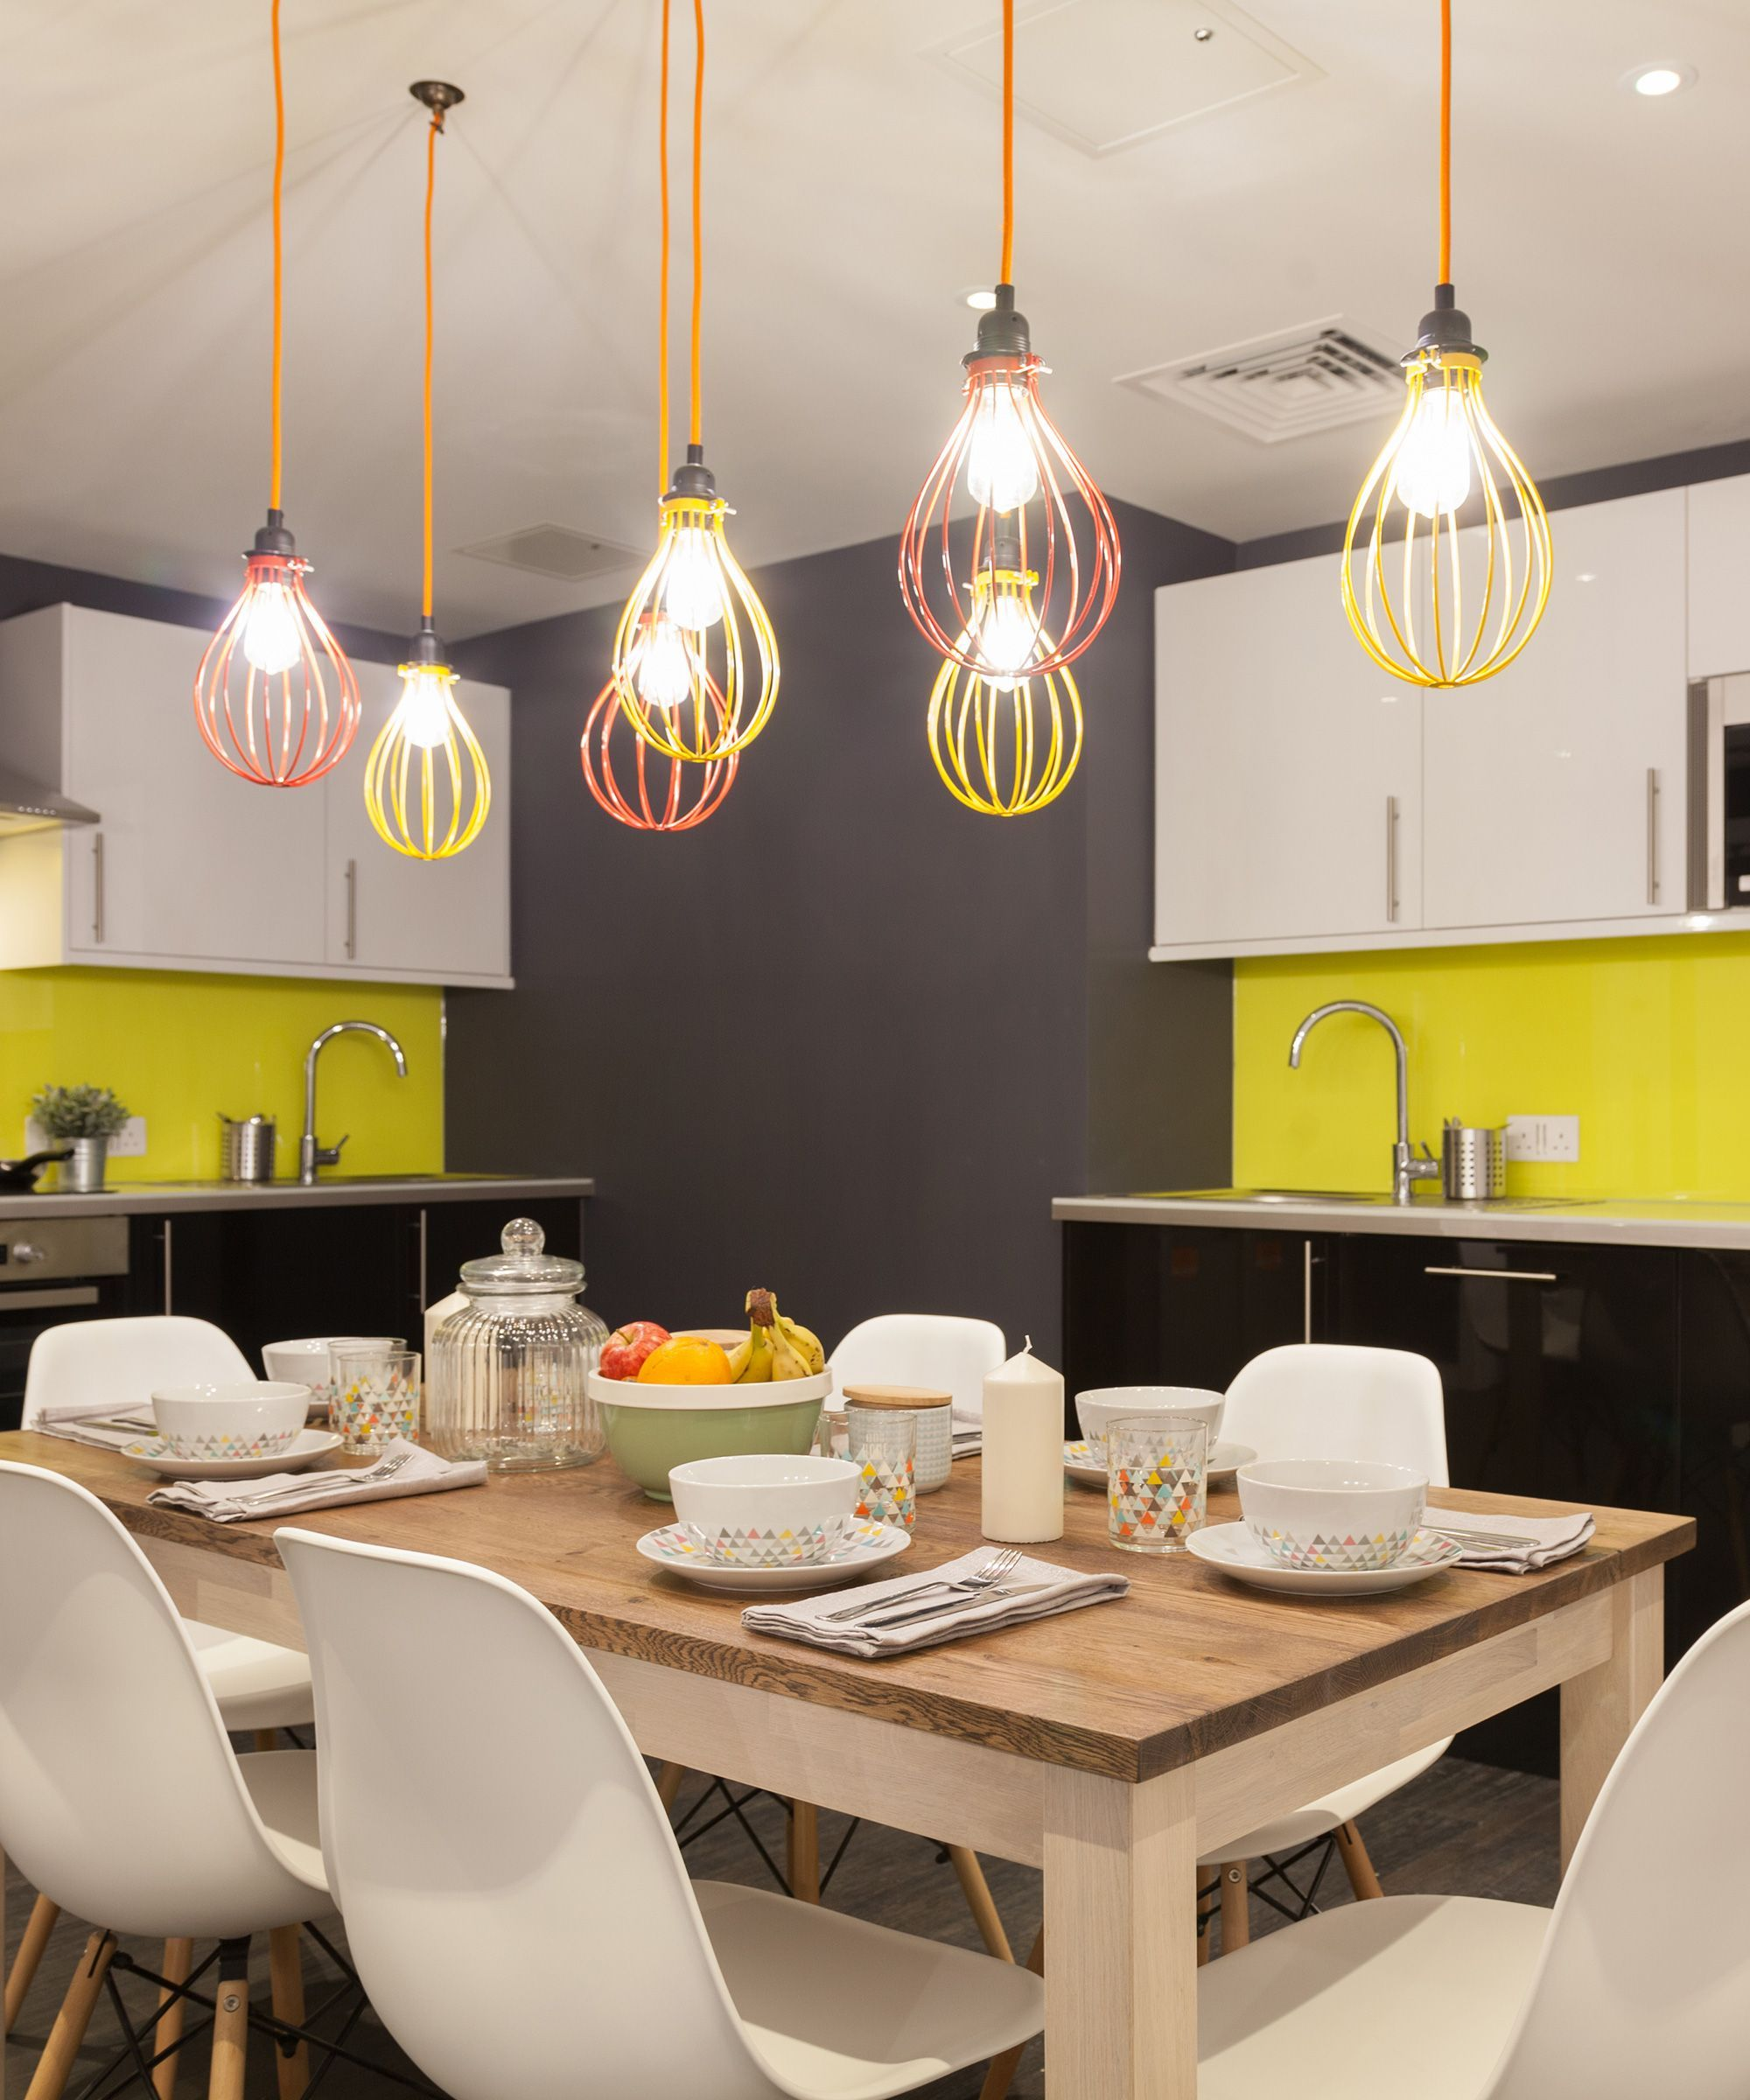 Co Living Flastshare Millennials Ways To Rent Communal Kitchen Co Housing Trendy Interiors